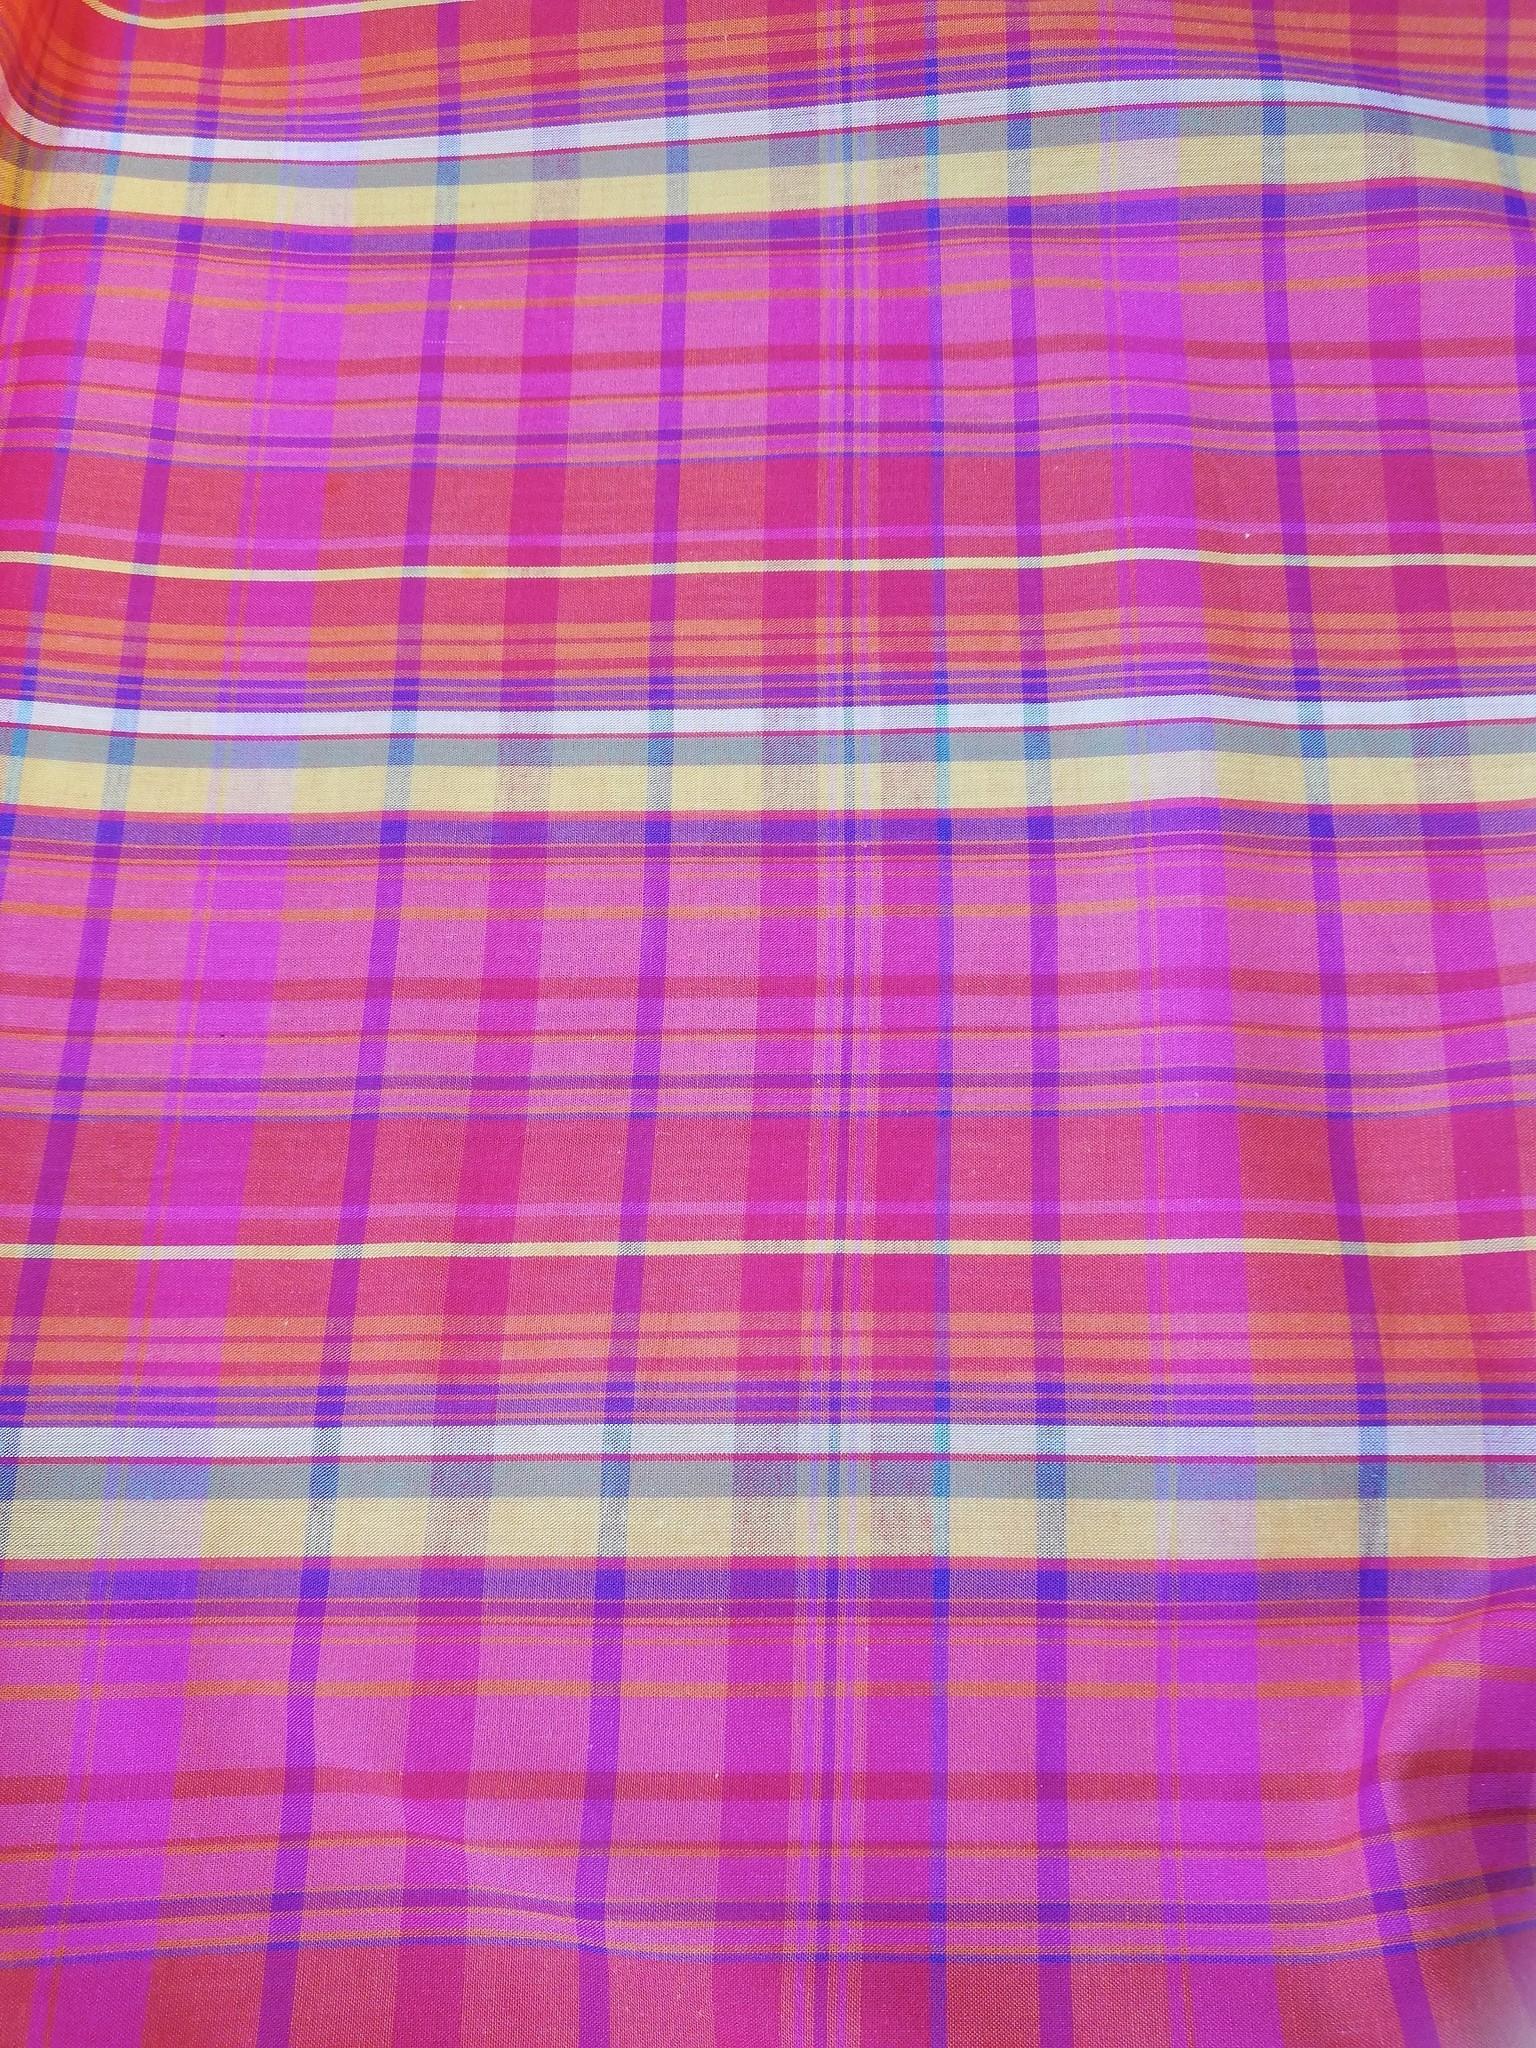 Cotton plaid fabric pink/orange/blue.